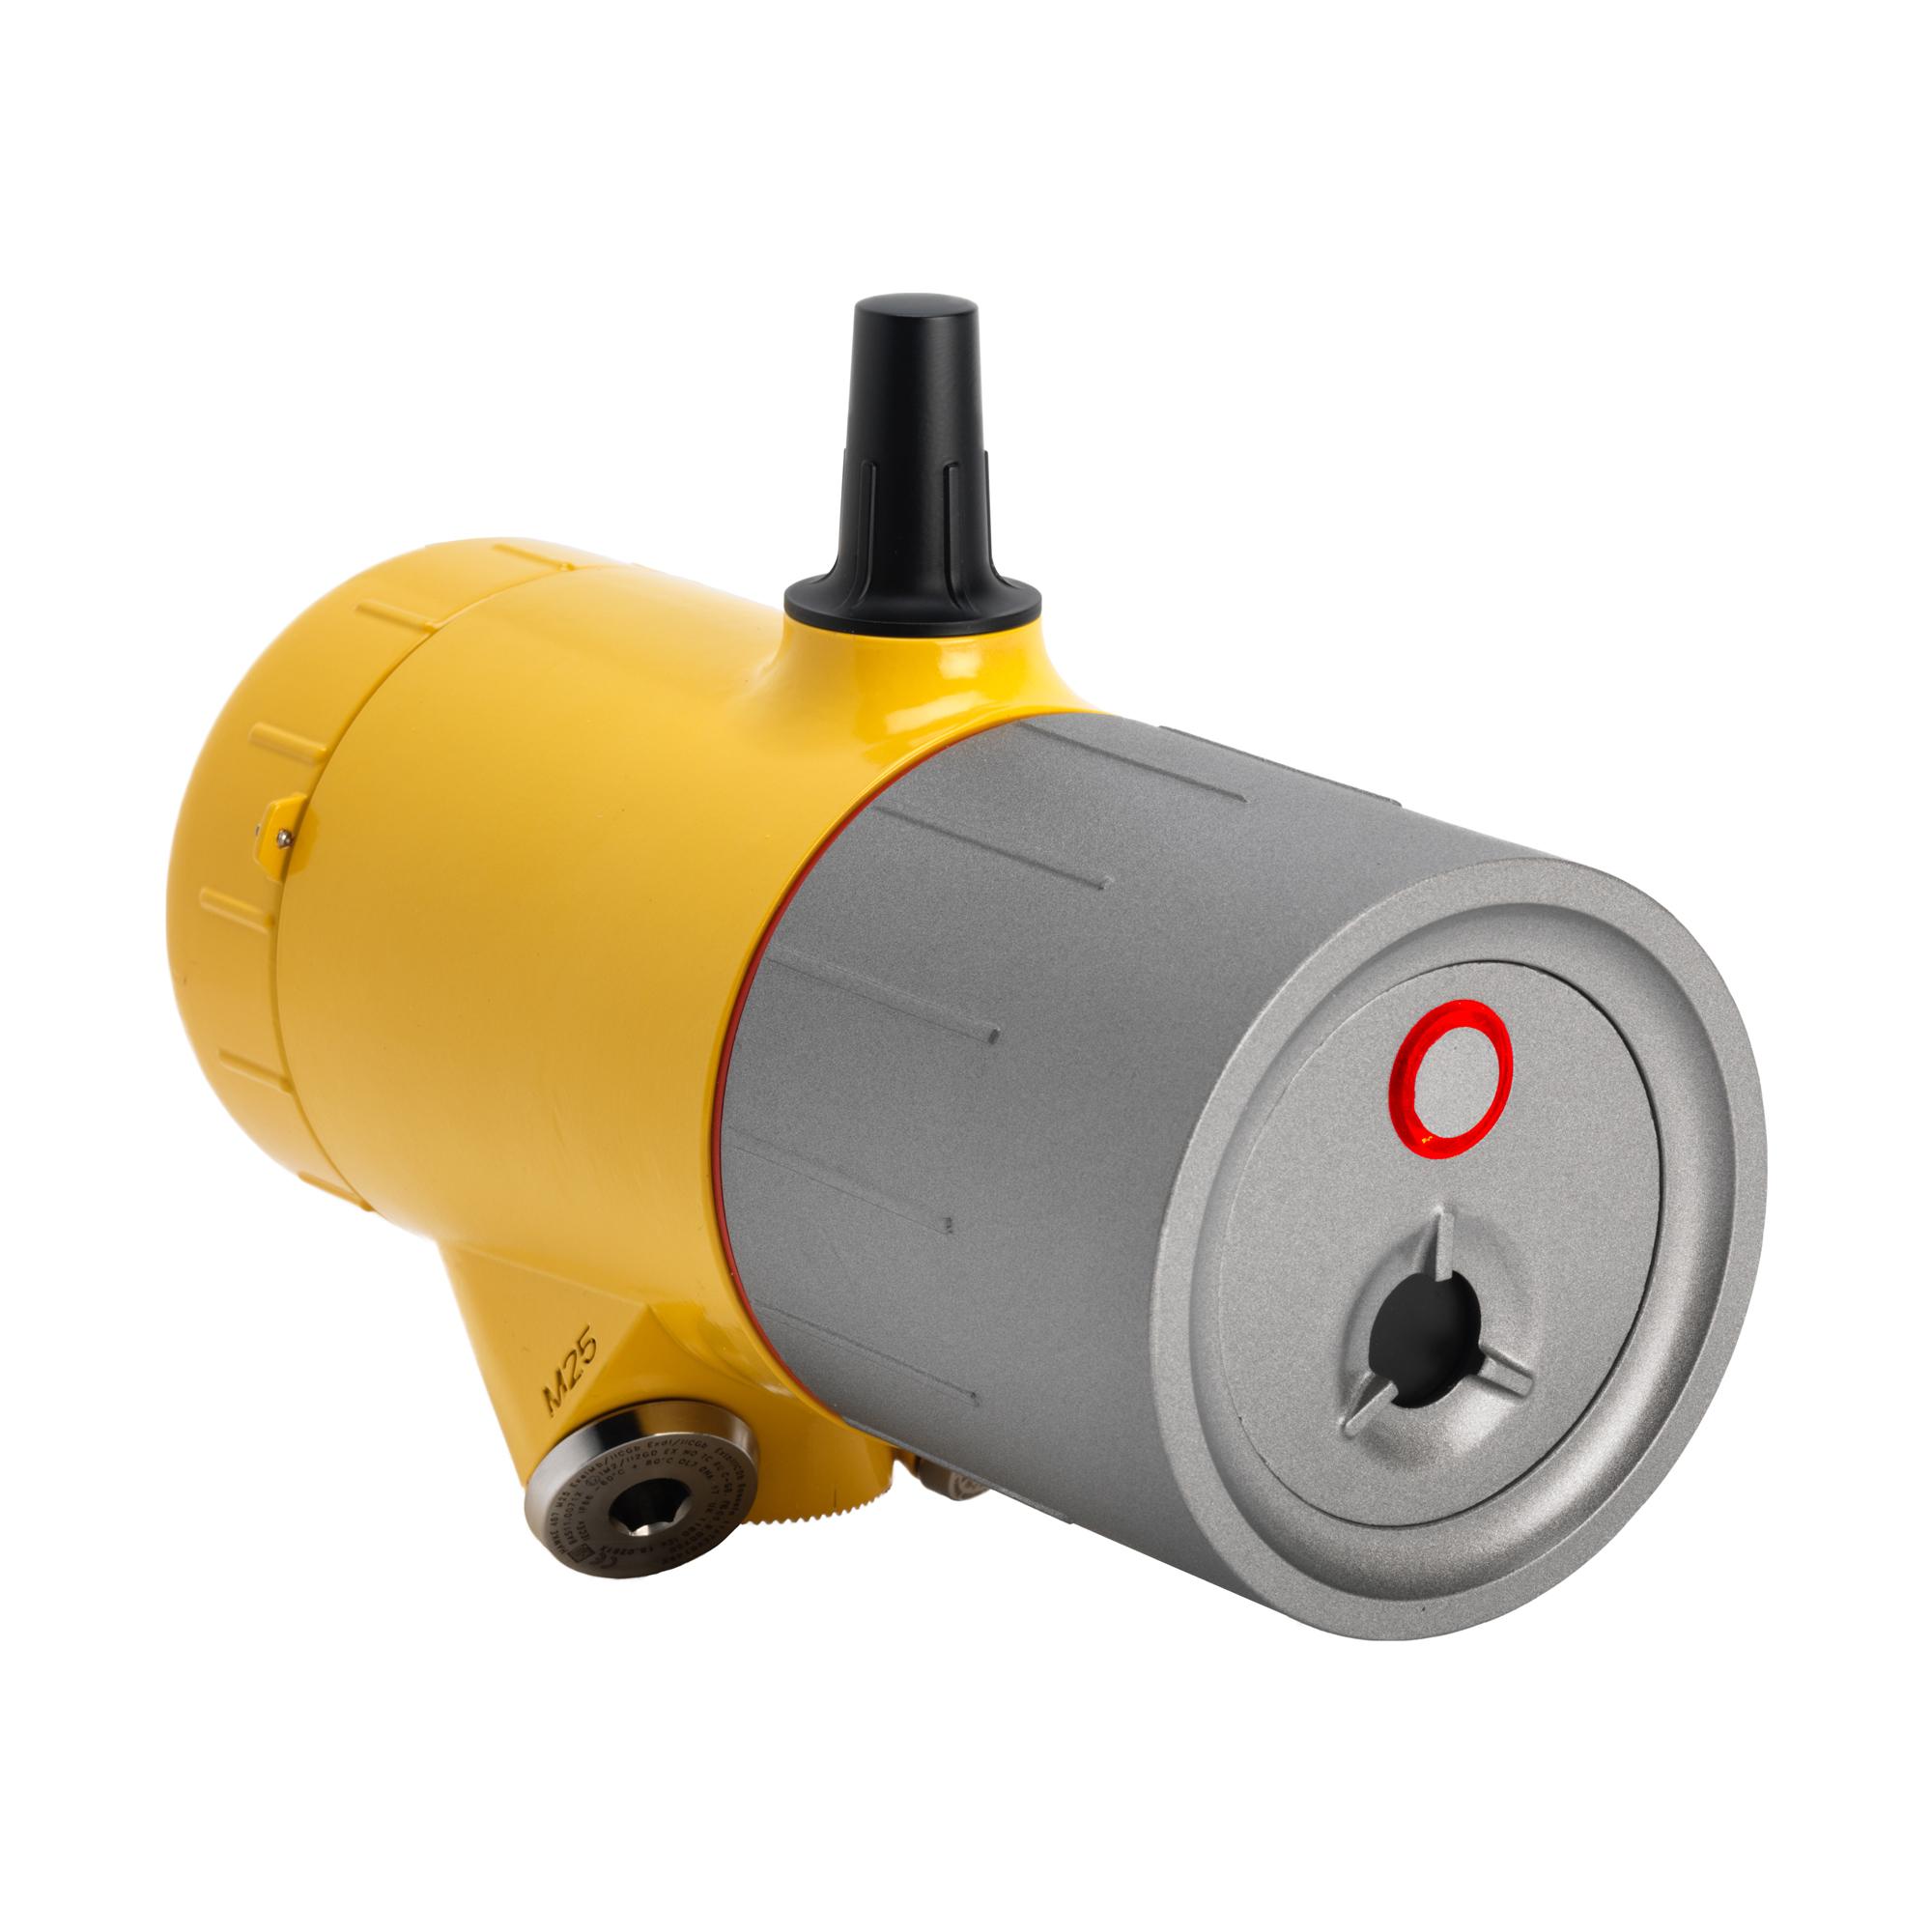 New ultrasonic gas detector   Engineer Live